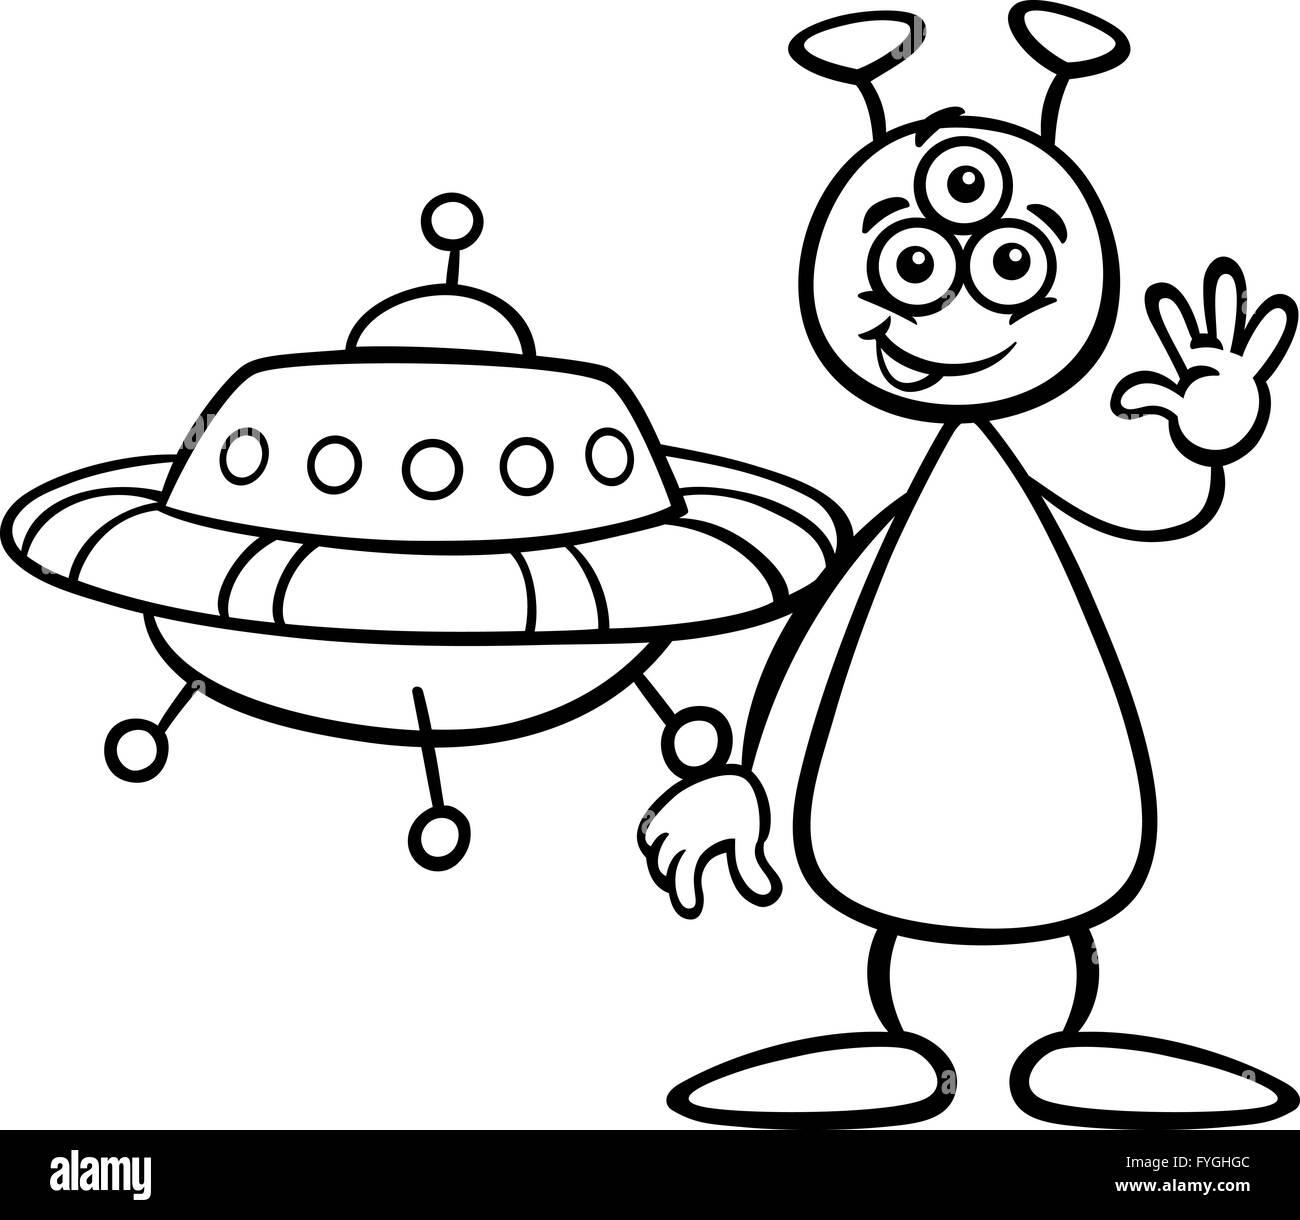 Cartoon Illustration Funny Alien Spaceship Stockfotos & Cartoon ...